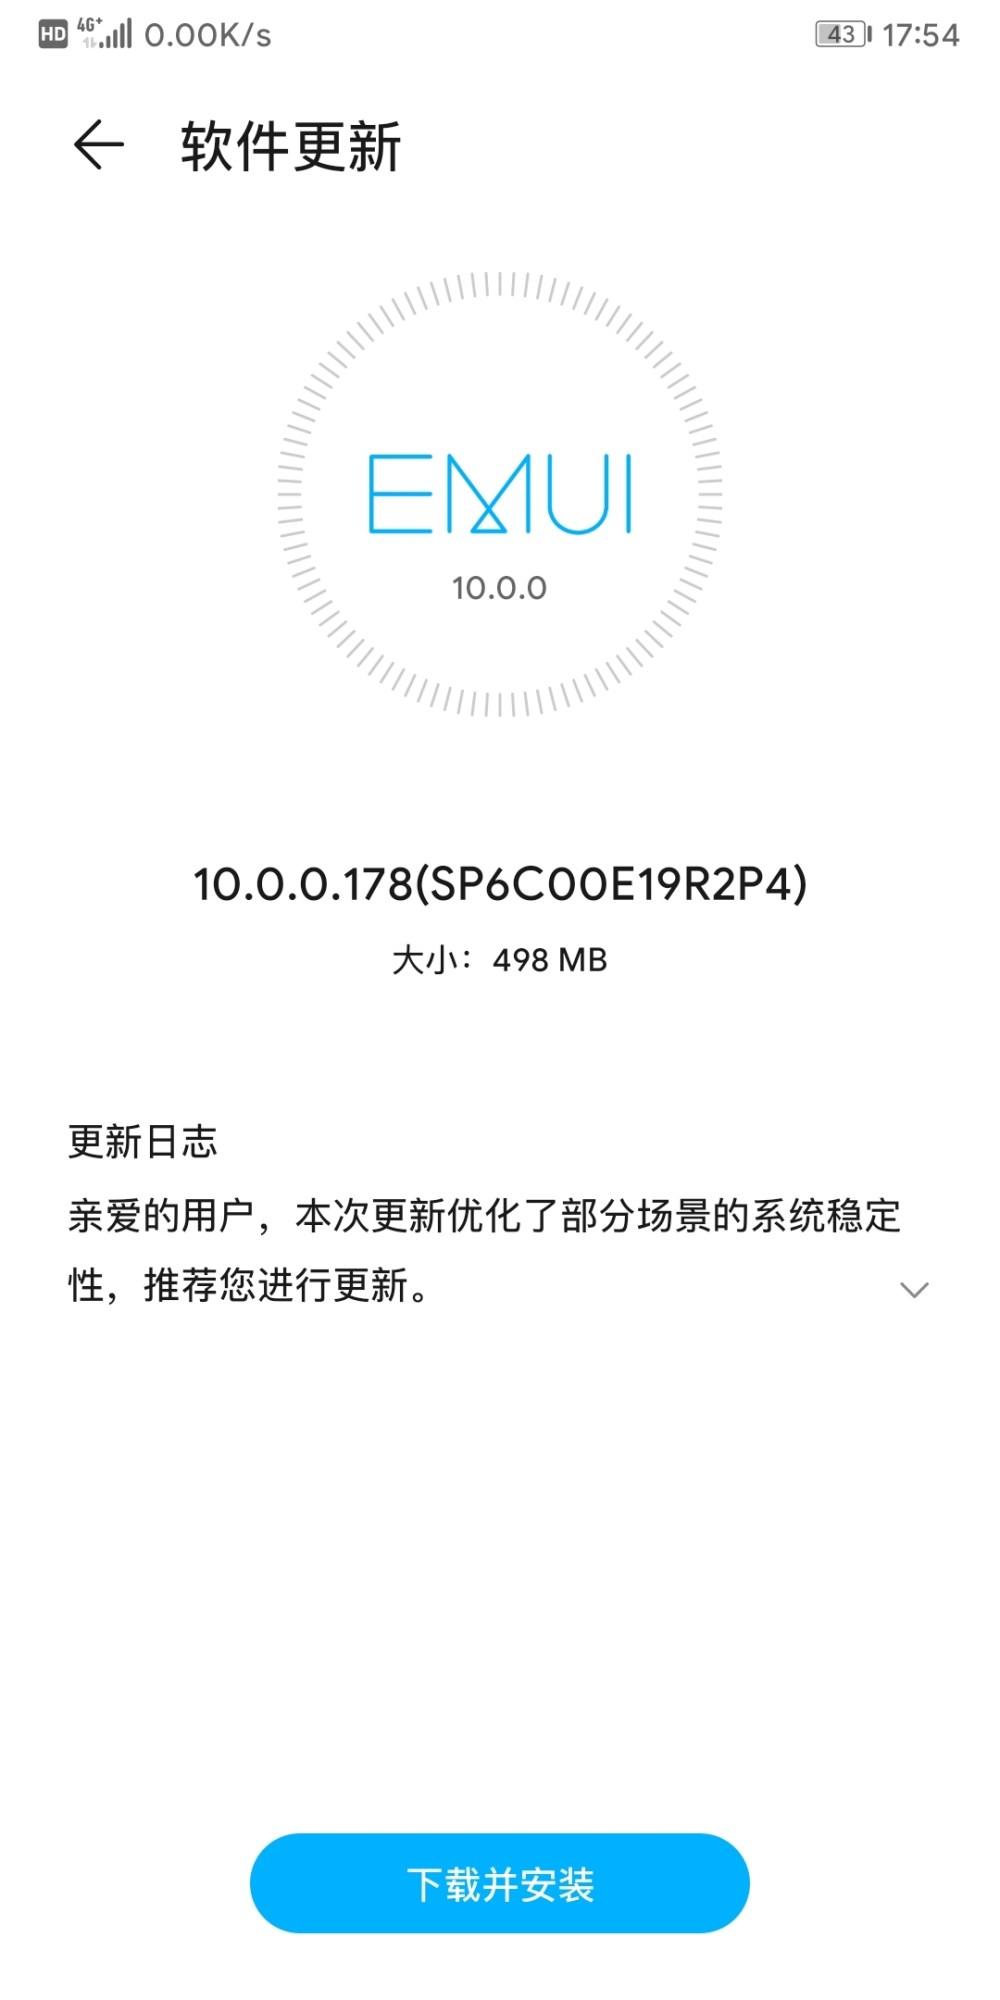 Honor V10 EMUI 10.0.0.178